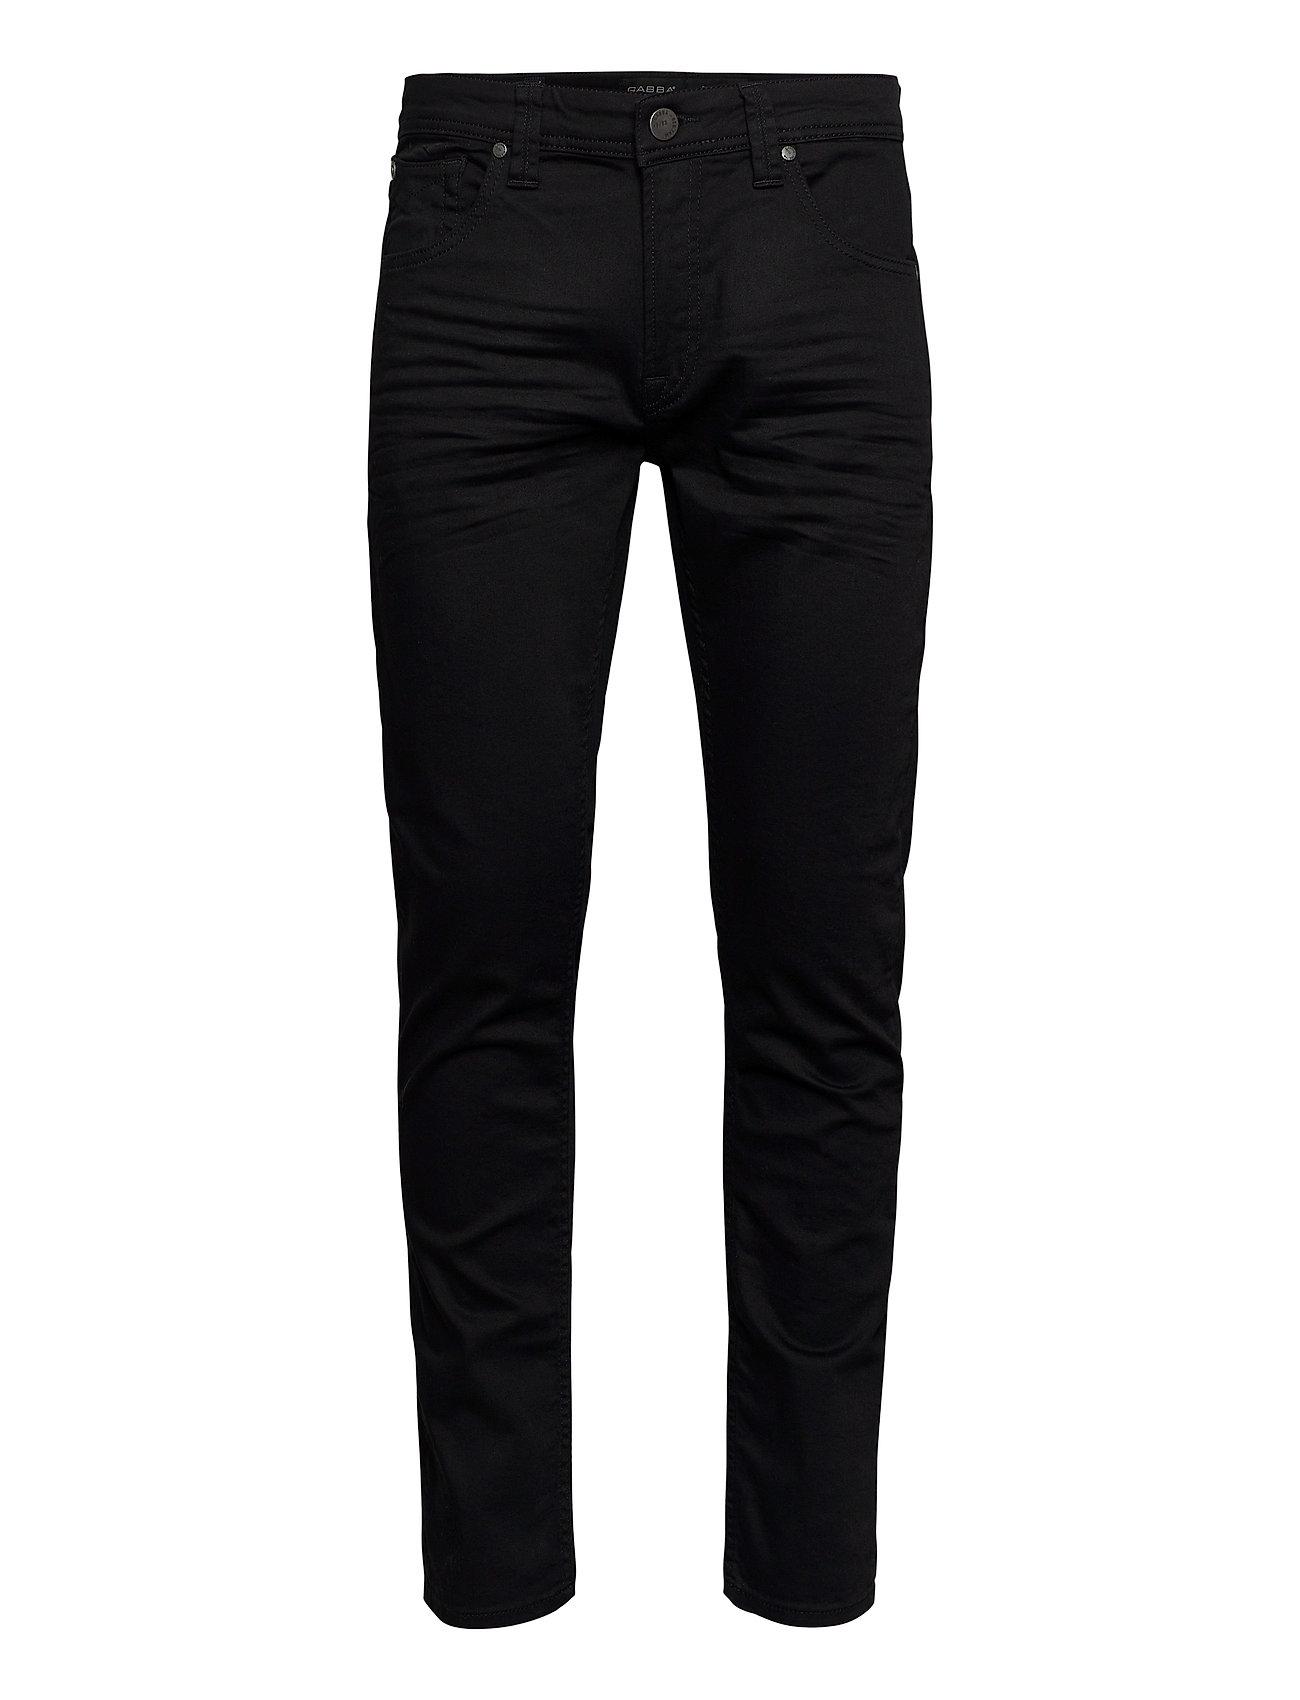 Image of Nico Black Night Jeans Jeans Sort Gabba (3445586811)